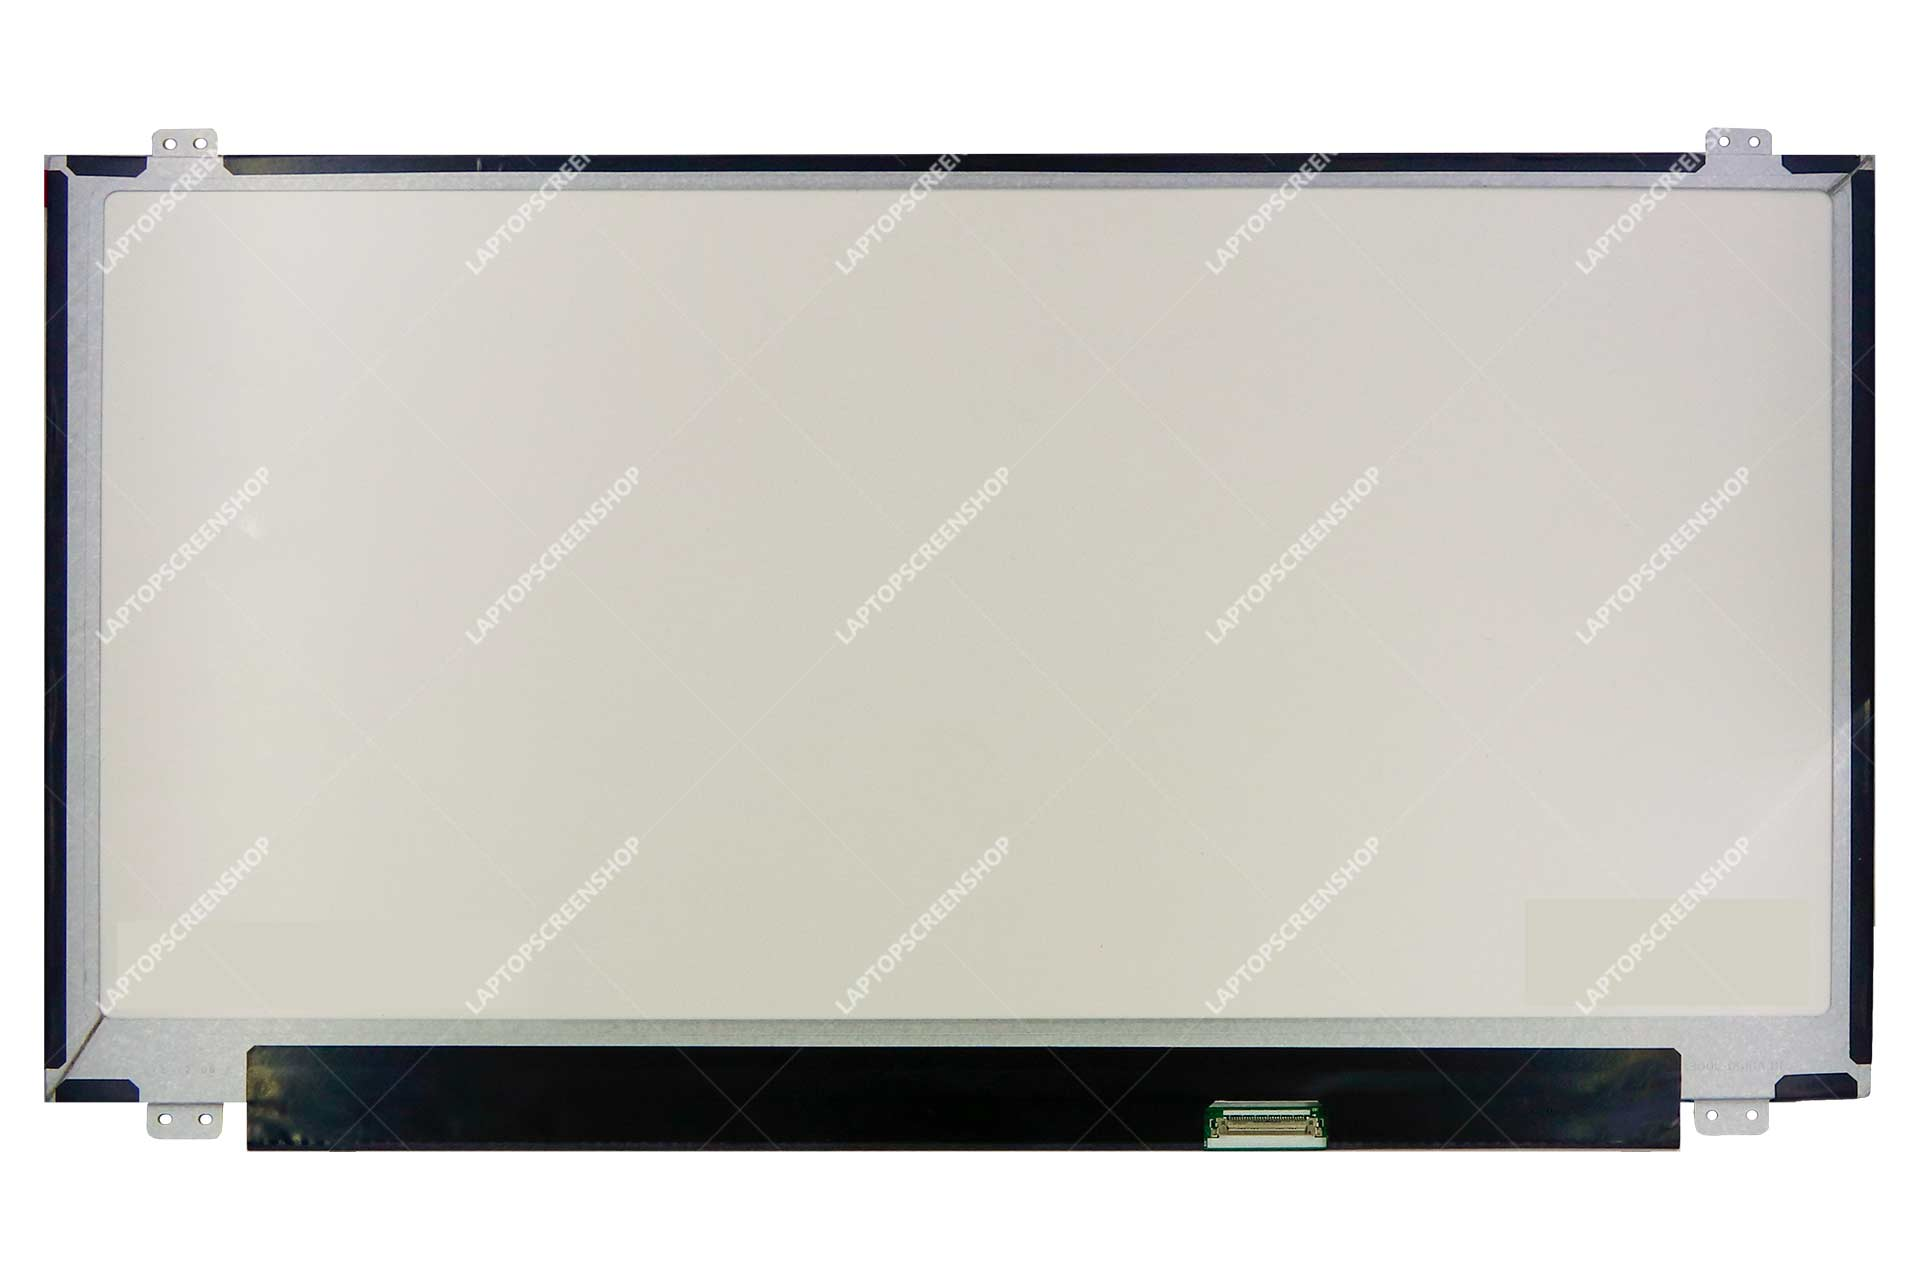 ACER-ASPIRE-E1-532-2477-LCD  HD فروشگاه لپ تاپ اسکرين   تعمير لپ تاپ